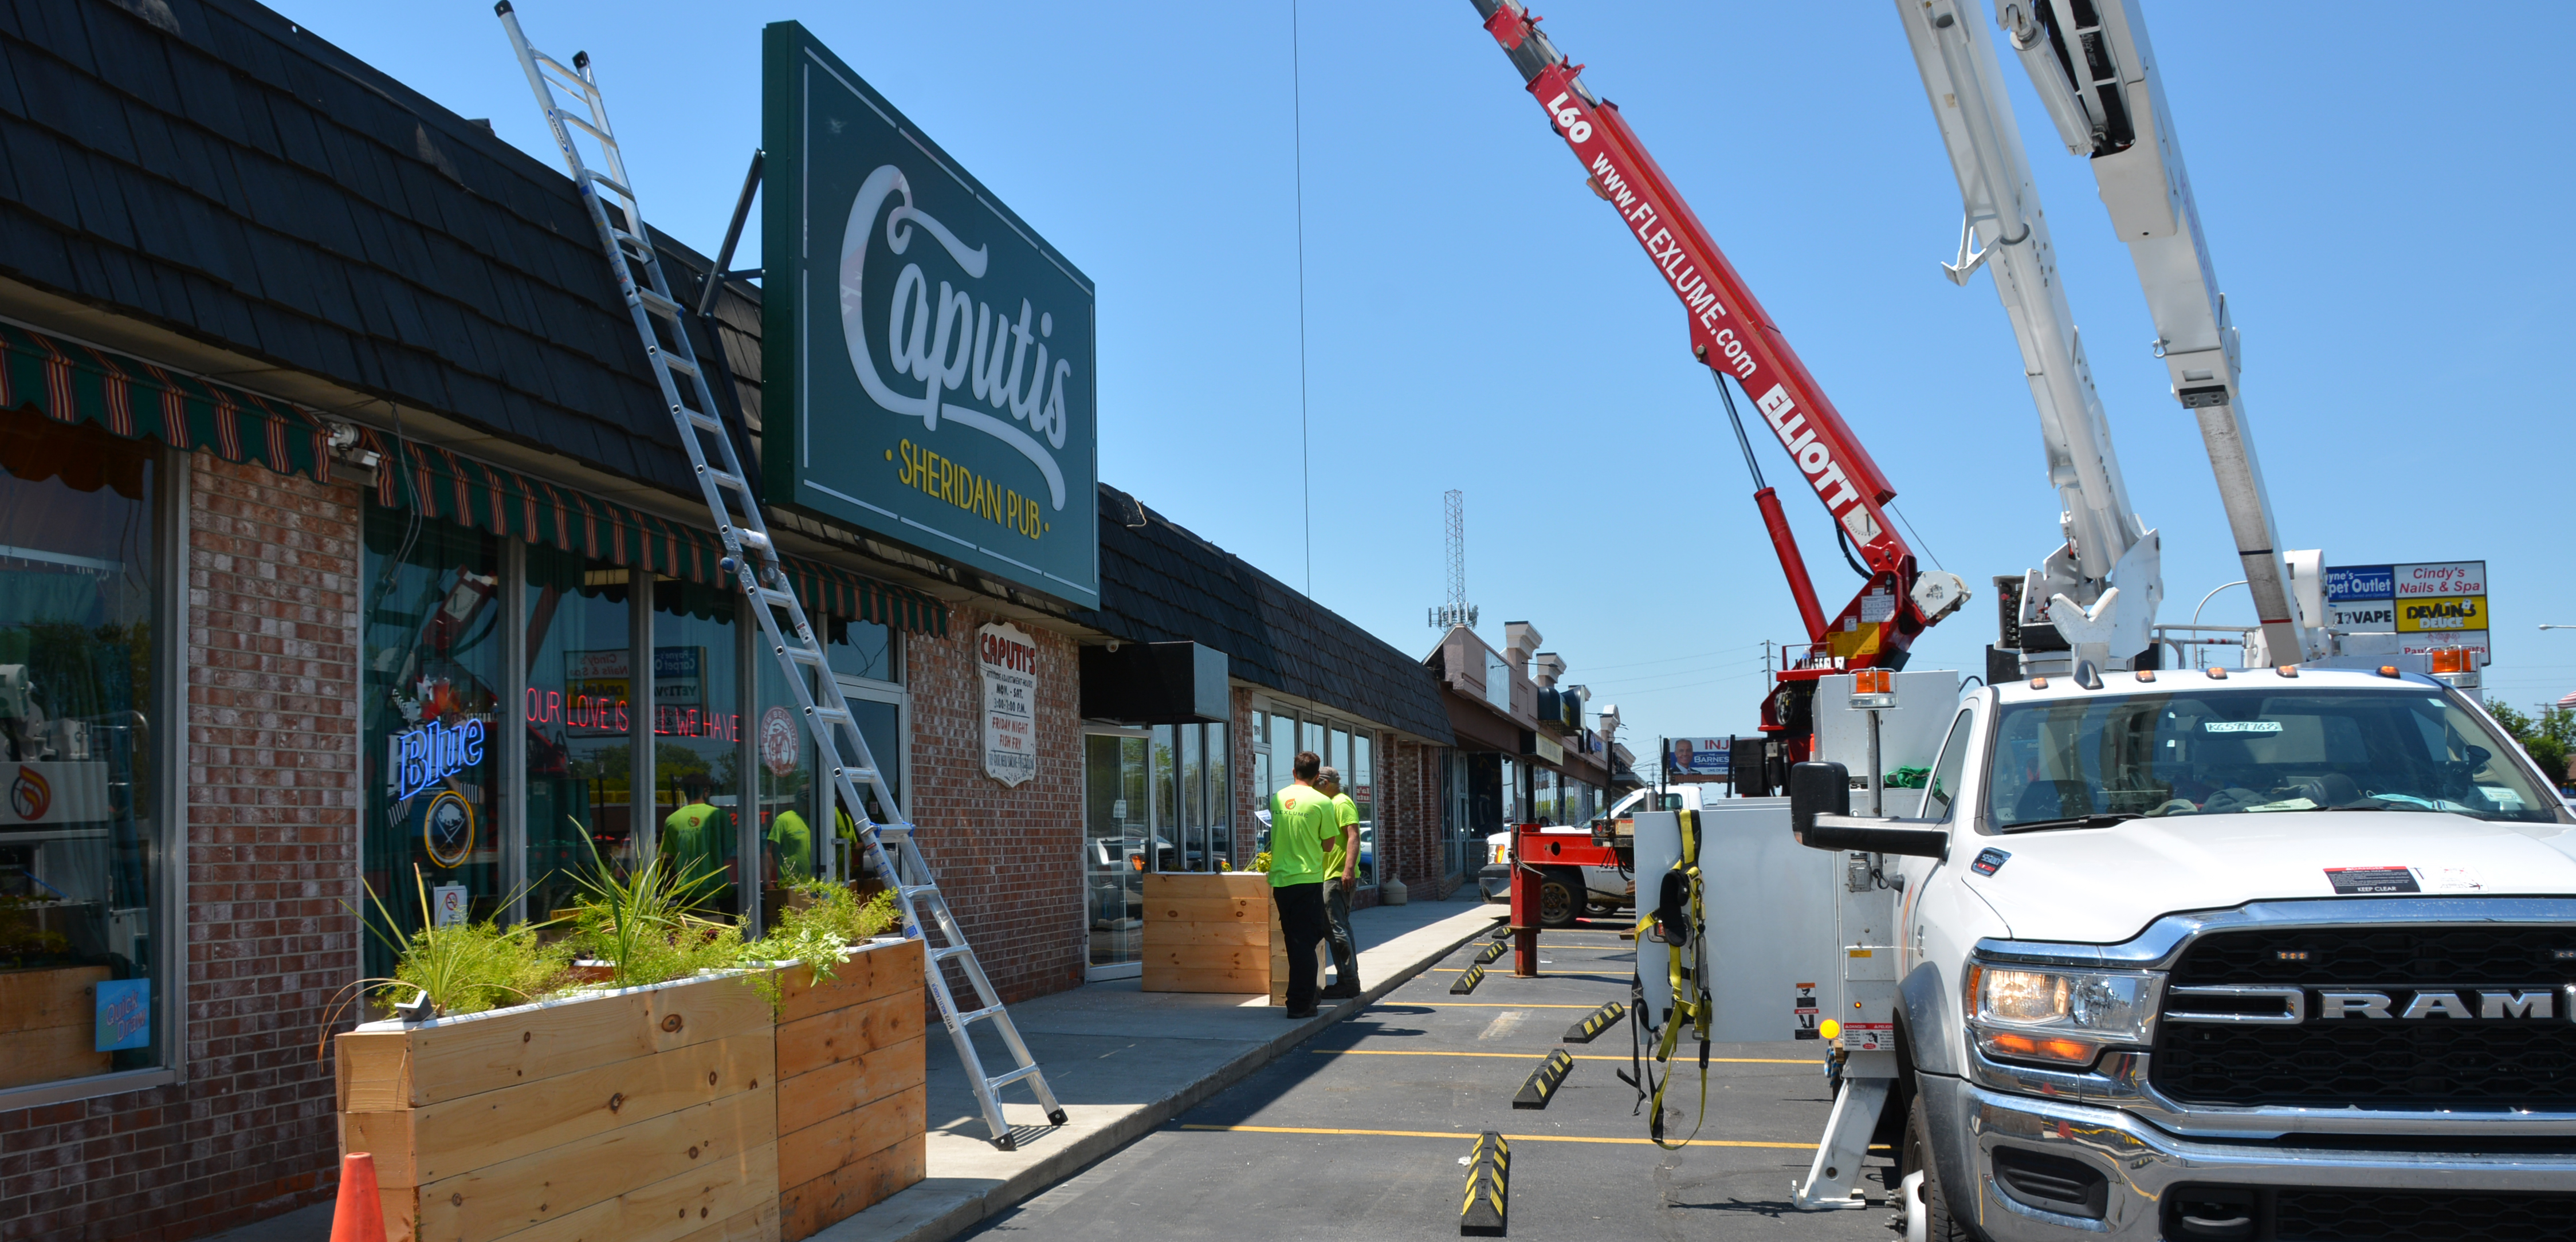 Caputis Sheridan Pub - Sign Installation Process